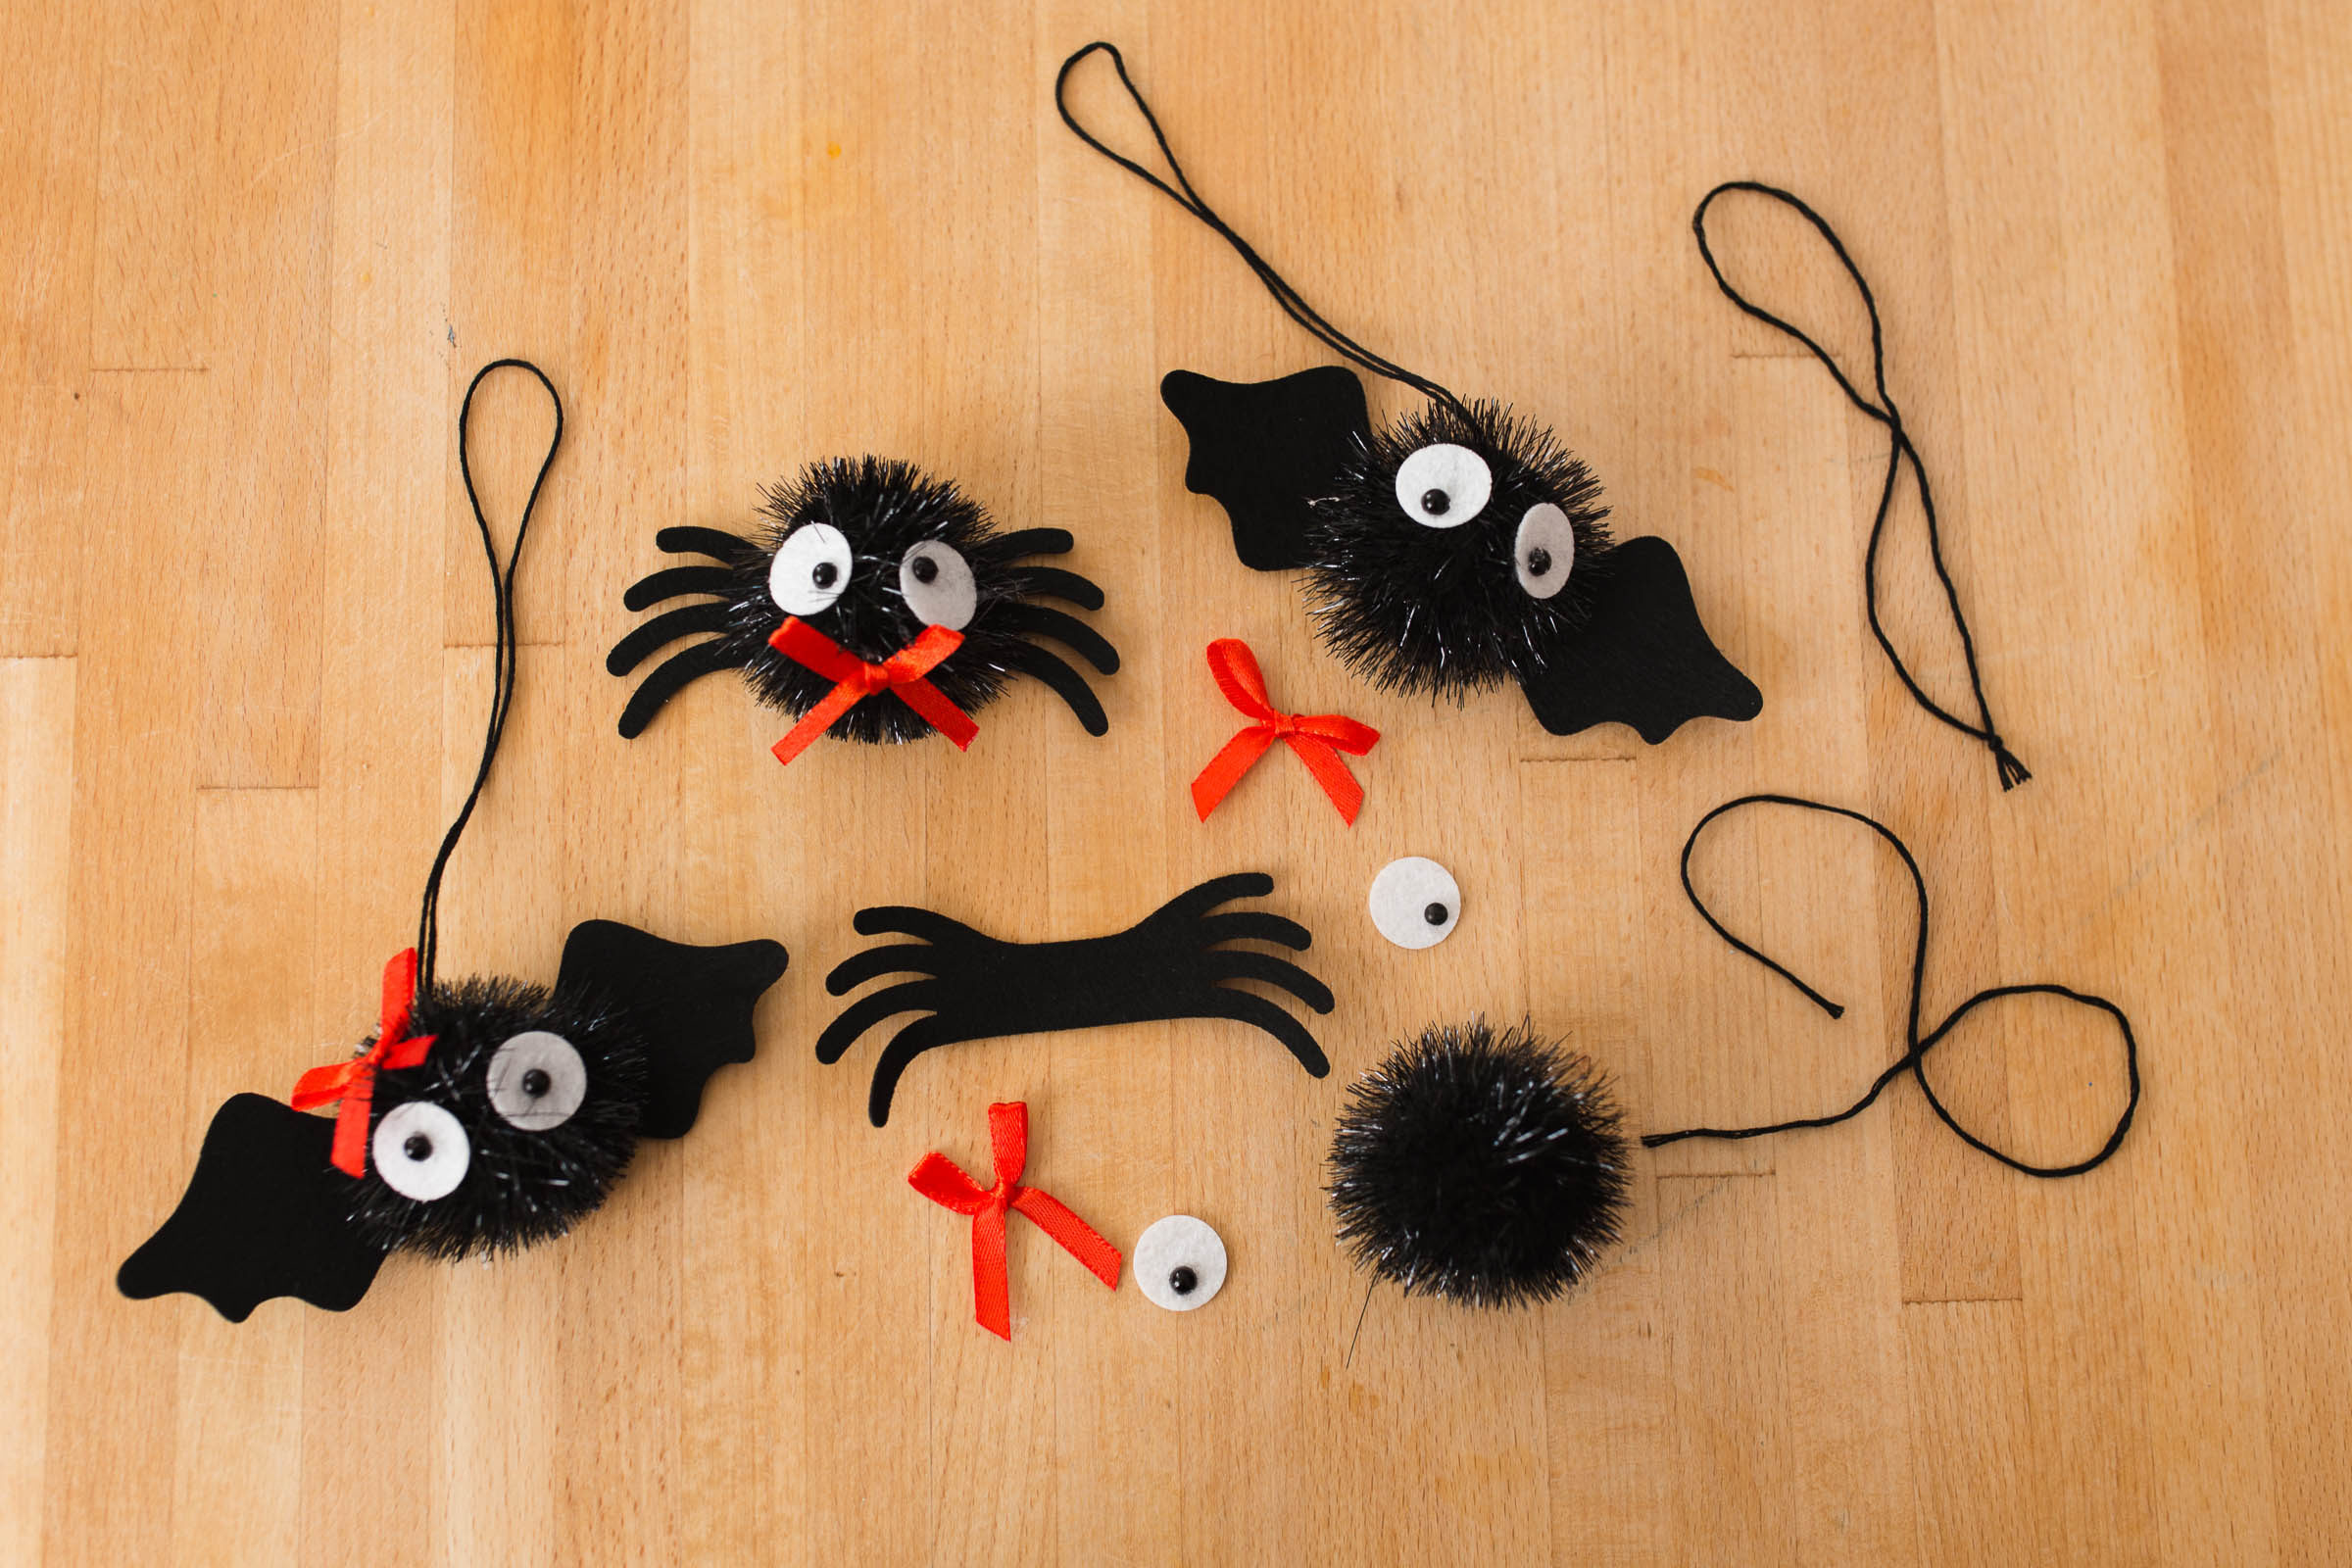 Halloweenpyssla med barn